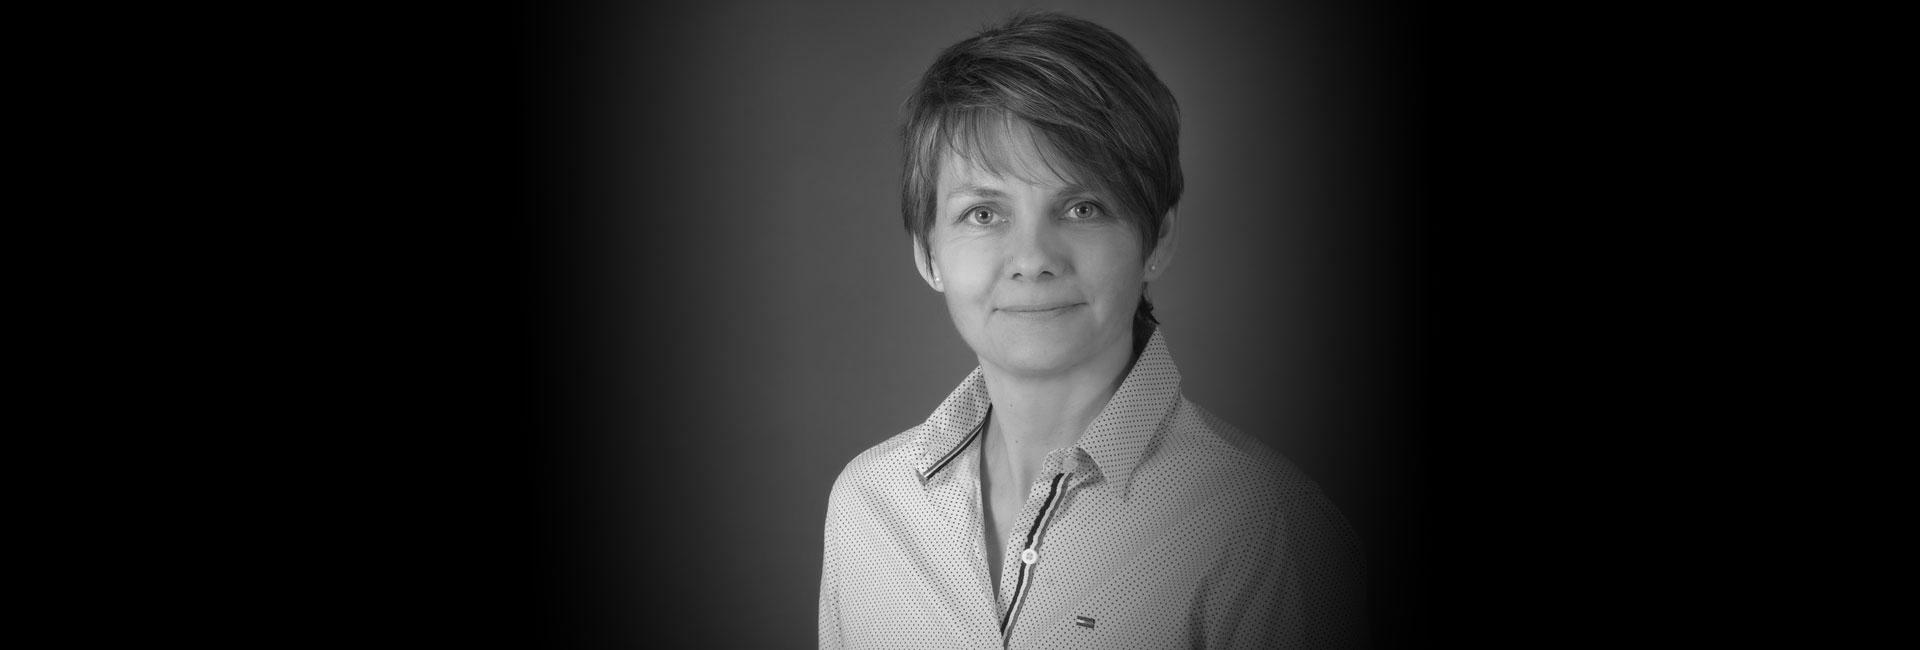 Kerstin Wittber aus Falkensee - Kreative Werbung